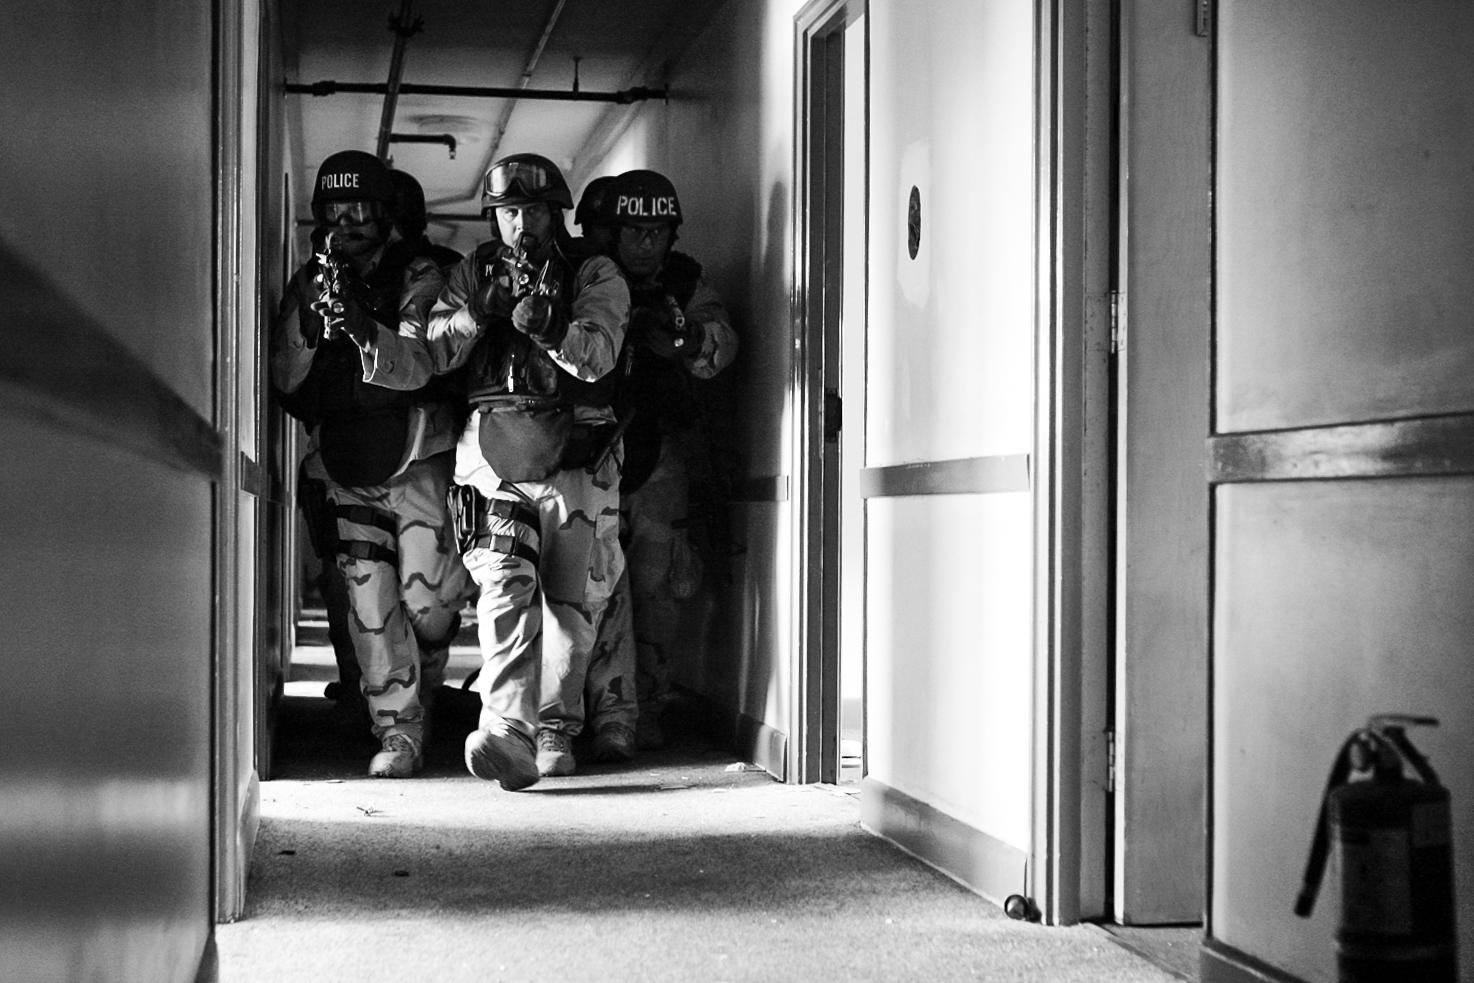 photojournalist chicago sun times homeland security drills lagrange ruthie hauge photography 02.jpg